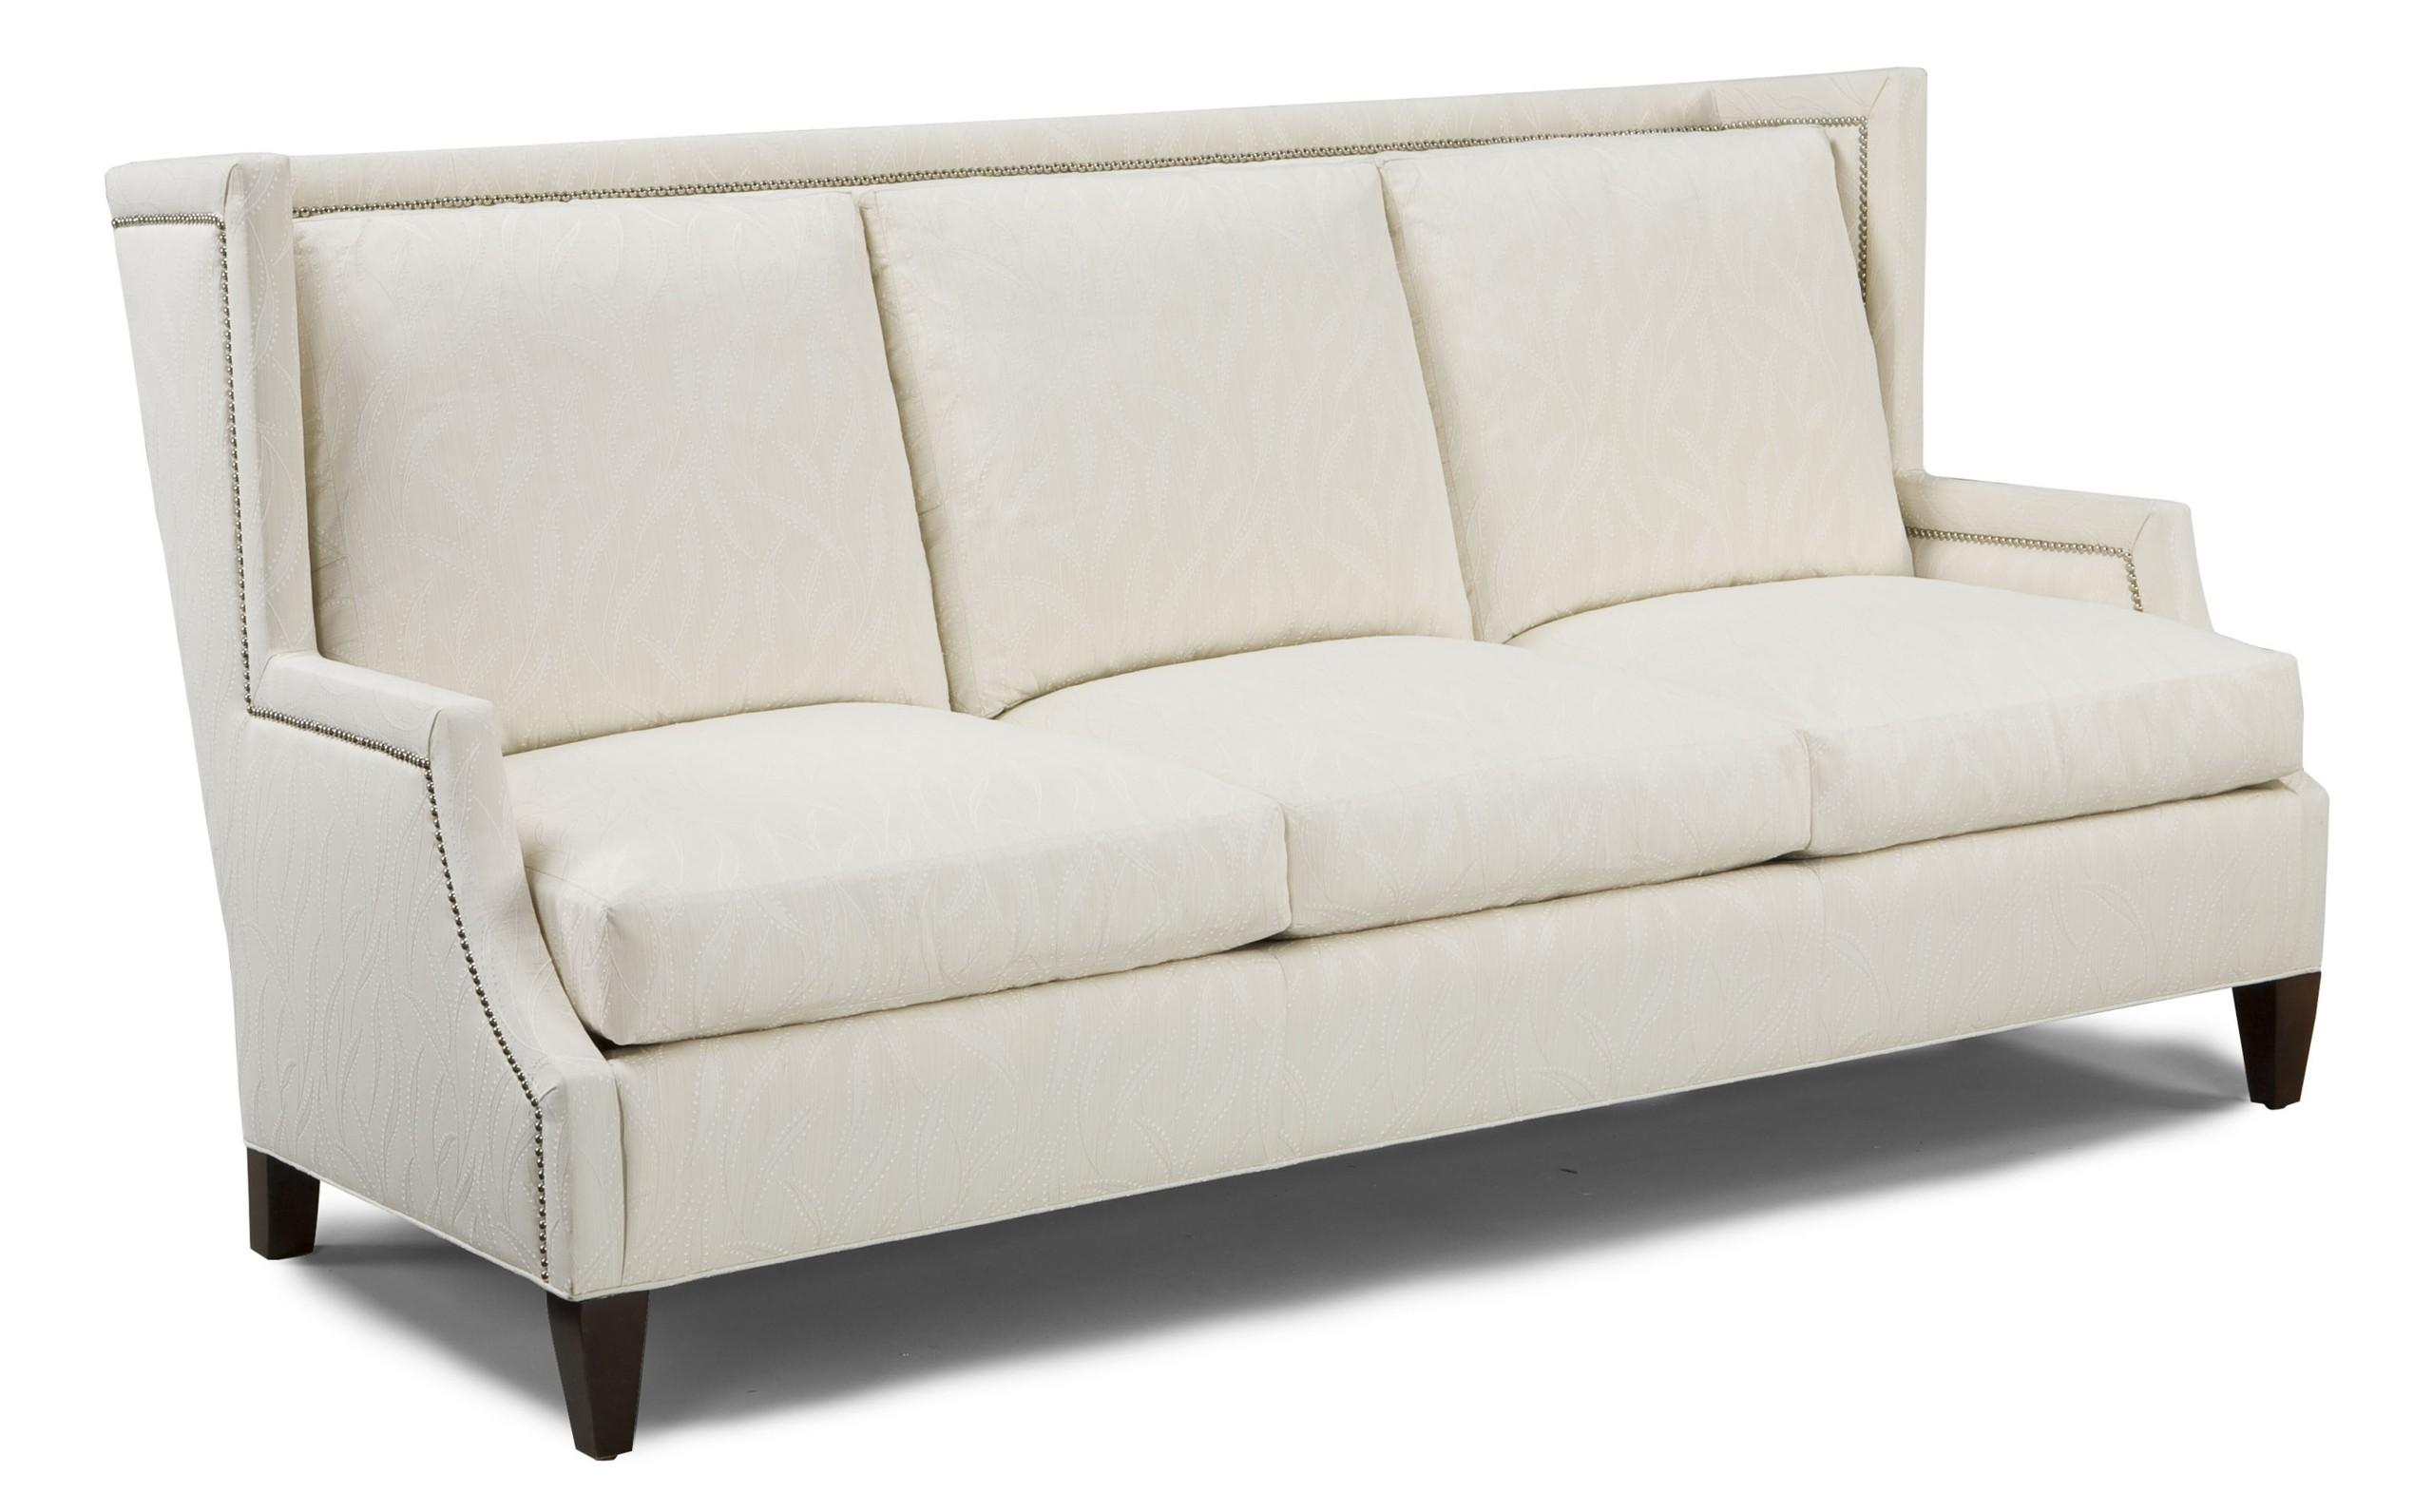 high back tufted sofa foter rh foter com high back sofas couch high back sofa